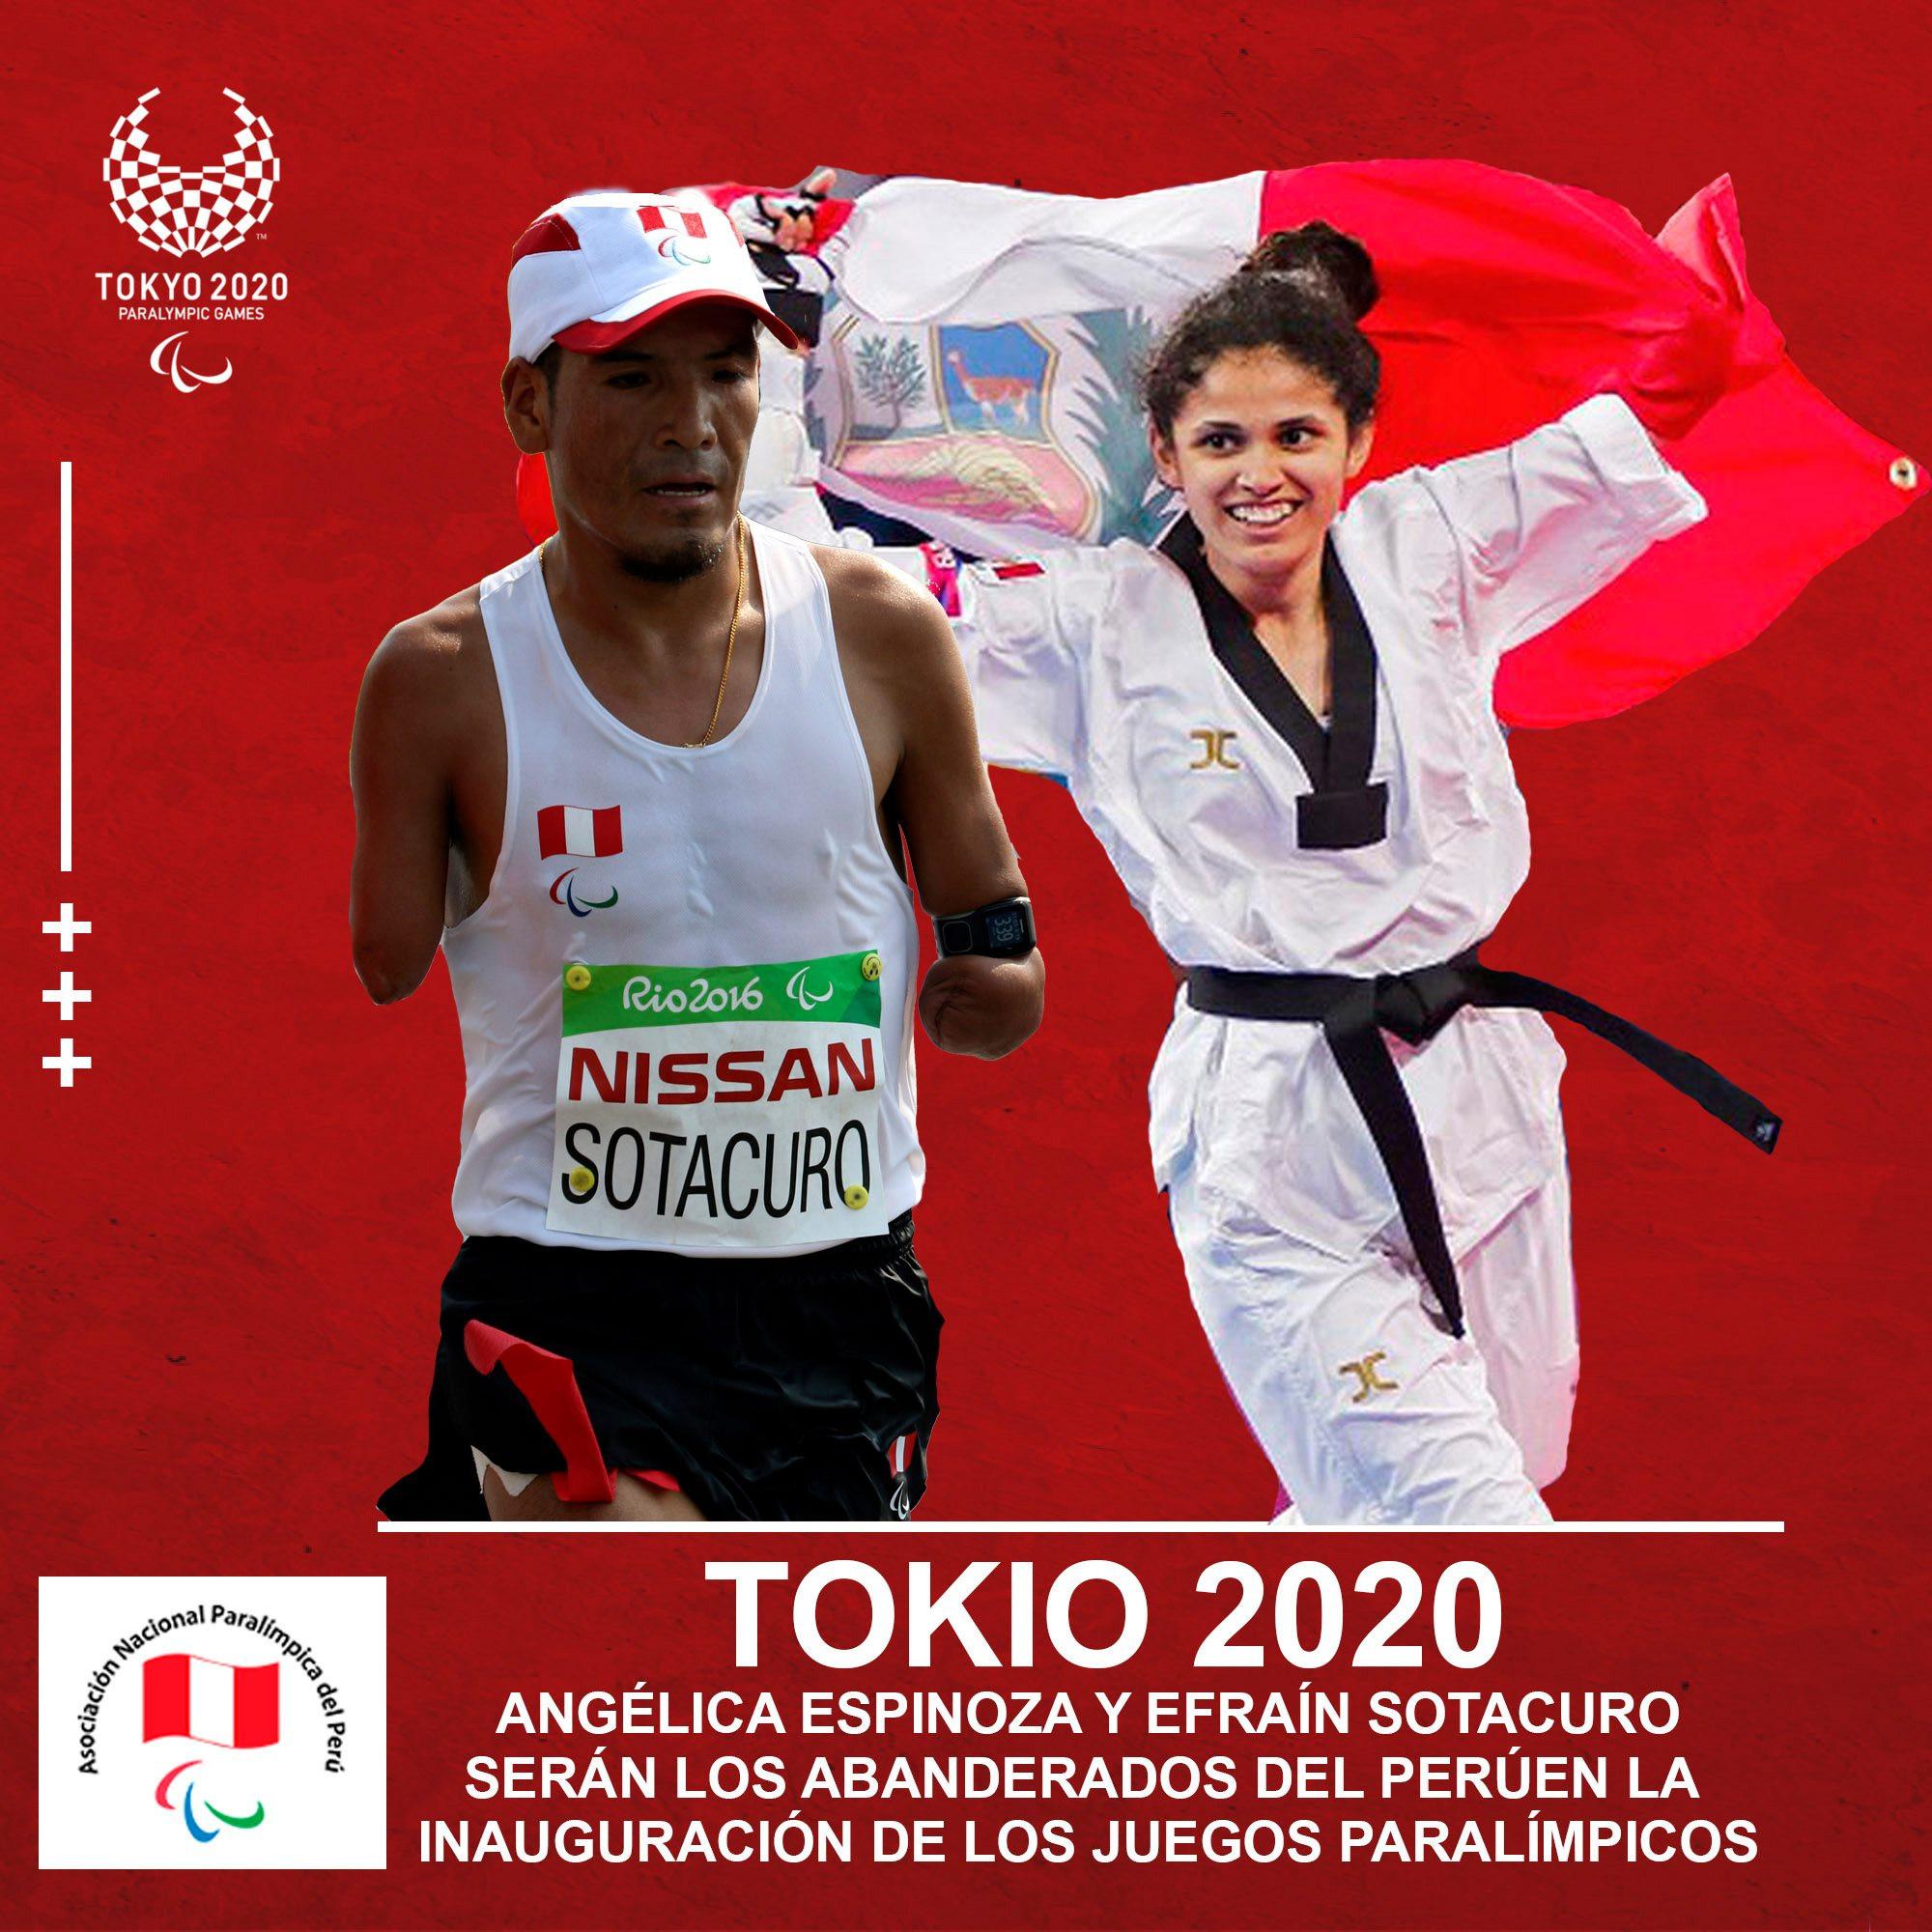 Lima 2019 Para taekwondo champion Espinoza picked as Peruvian flagbearer for Tokyo 2020